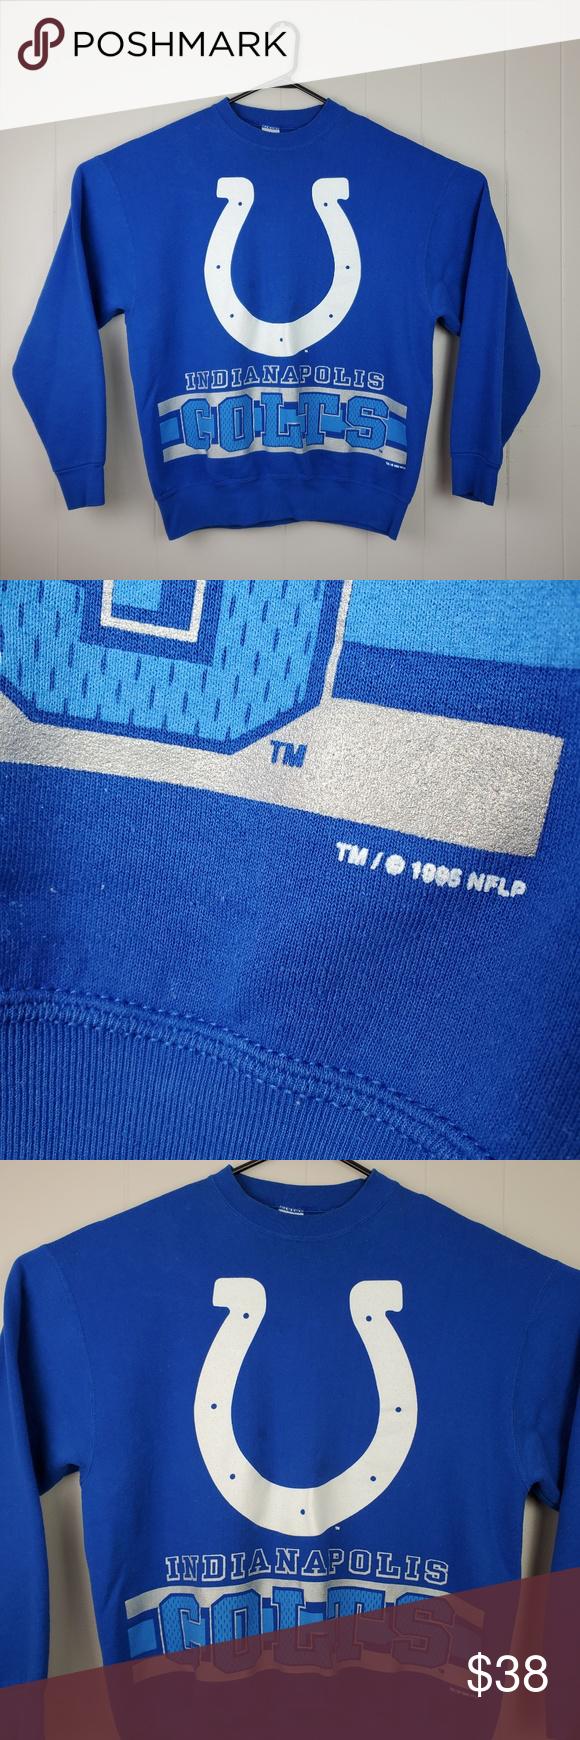 Vintage 1995 Indianapolis Colts Sweatshirt Vintage Indianapolis Colts Salem Sportswear 1995 Crewneck Sweats Sweatshirts Vintage Sweatshirt Crew Neck Sweatshirt [ 1740 x 580 Pixel ]